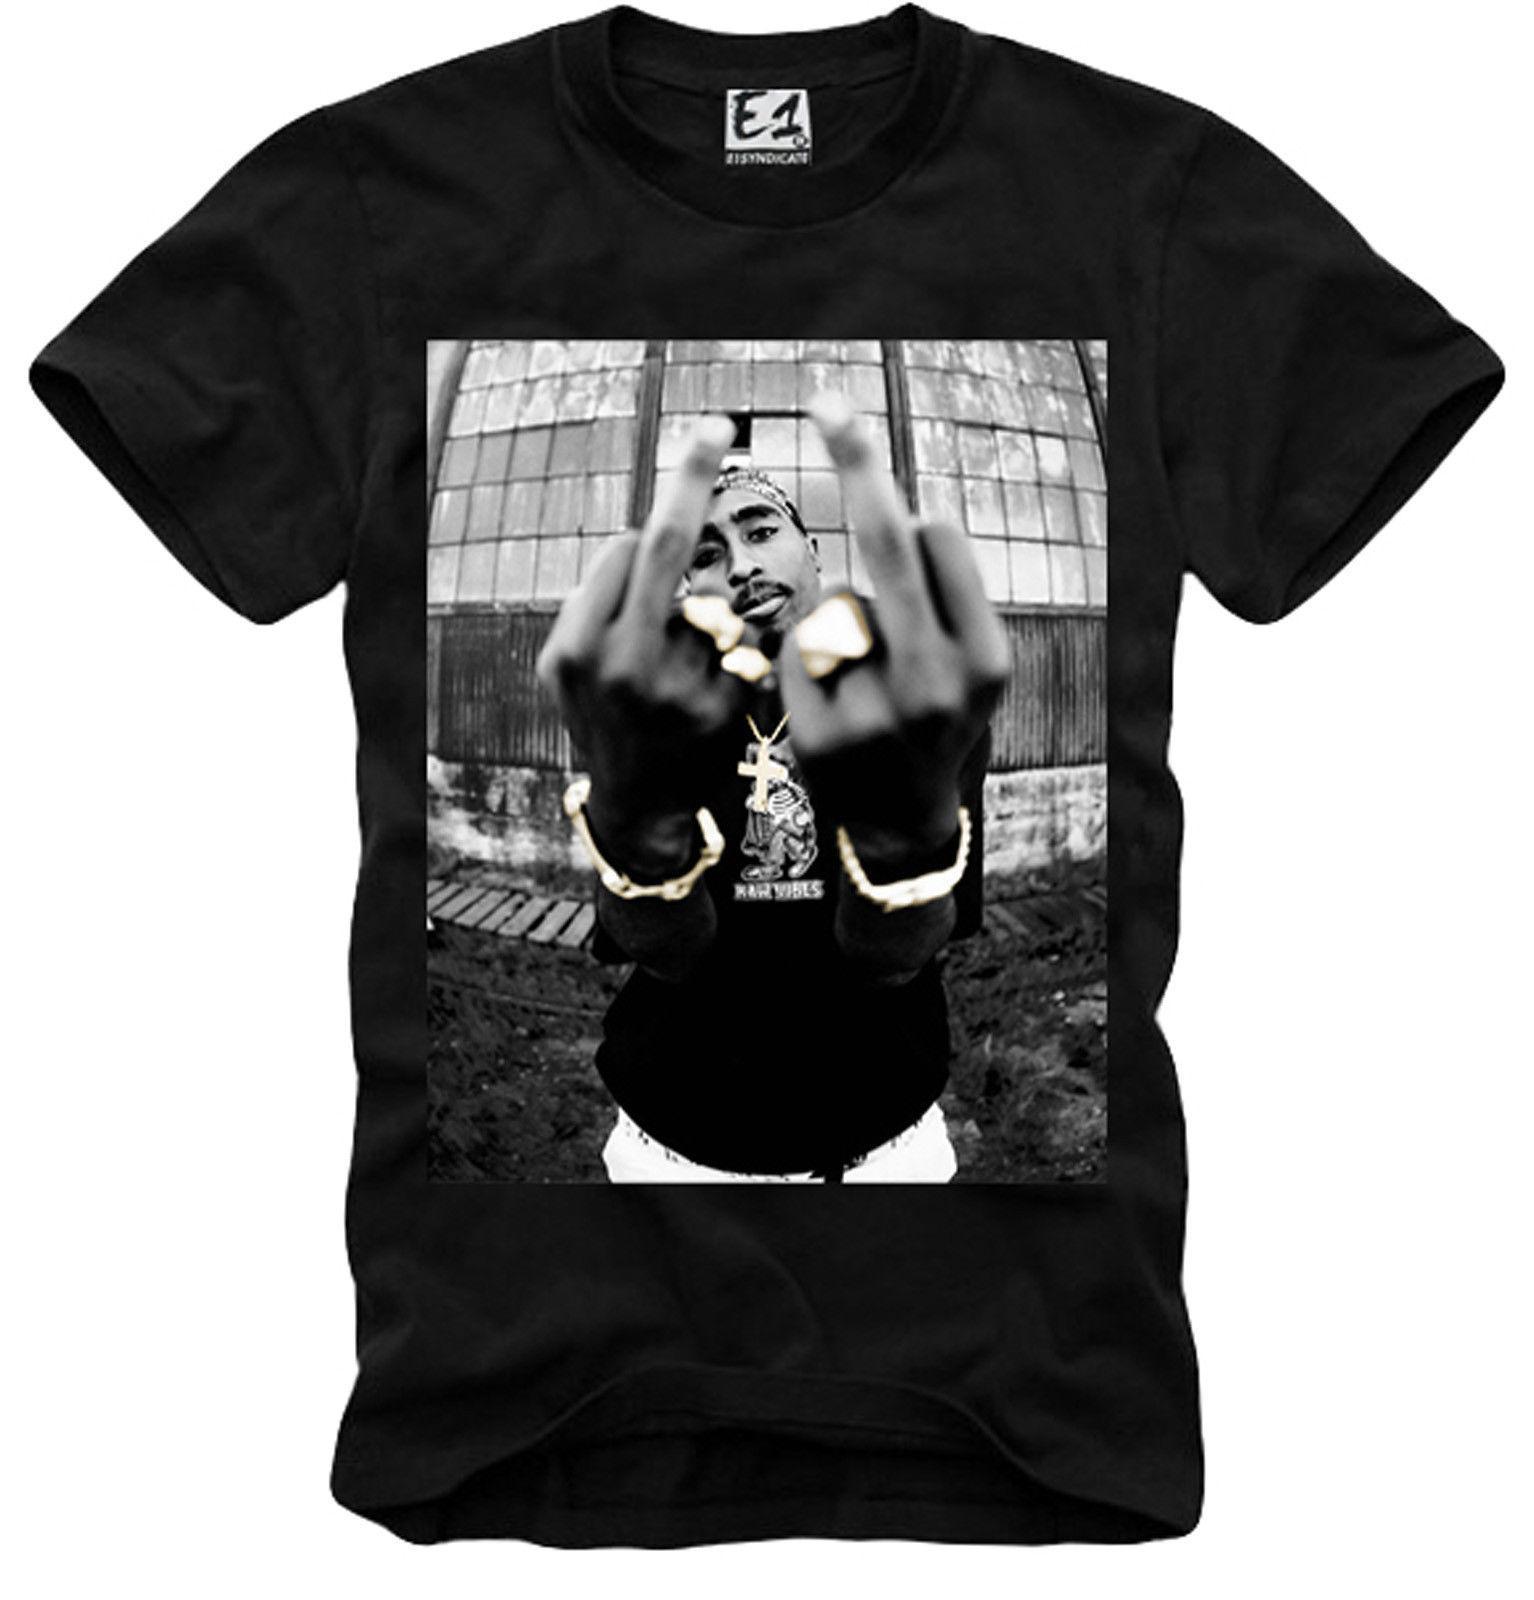 7252065b912a E1SYNDICATE T SHIRT 2PAC TUPAC SHAKUR NWA EAZY E SNOOP BIGGIE 3056b Mens  2018 Fashion Brand T Shirt O Neck 100%cotton T Shirt Short Sleeve Shirt  Novelty T ...